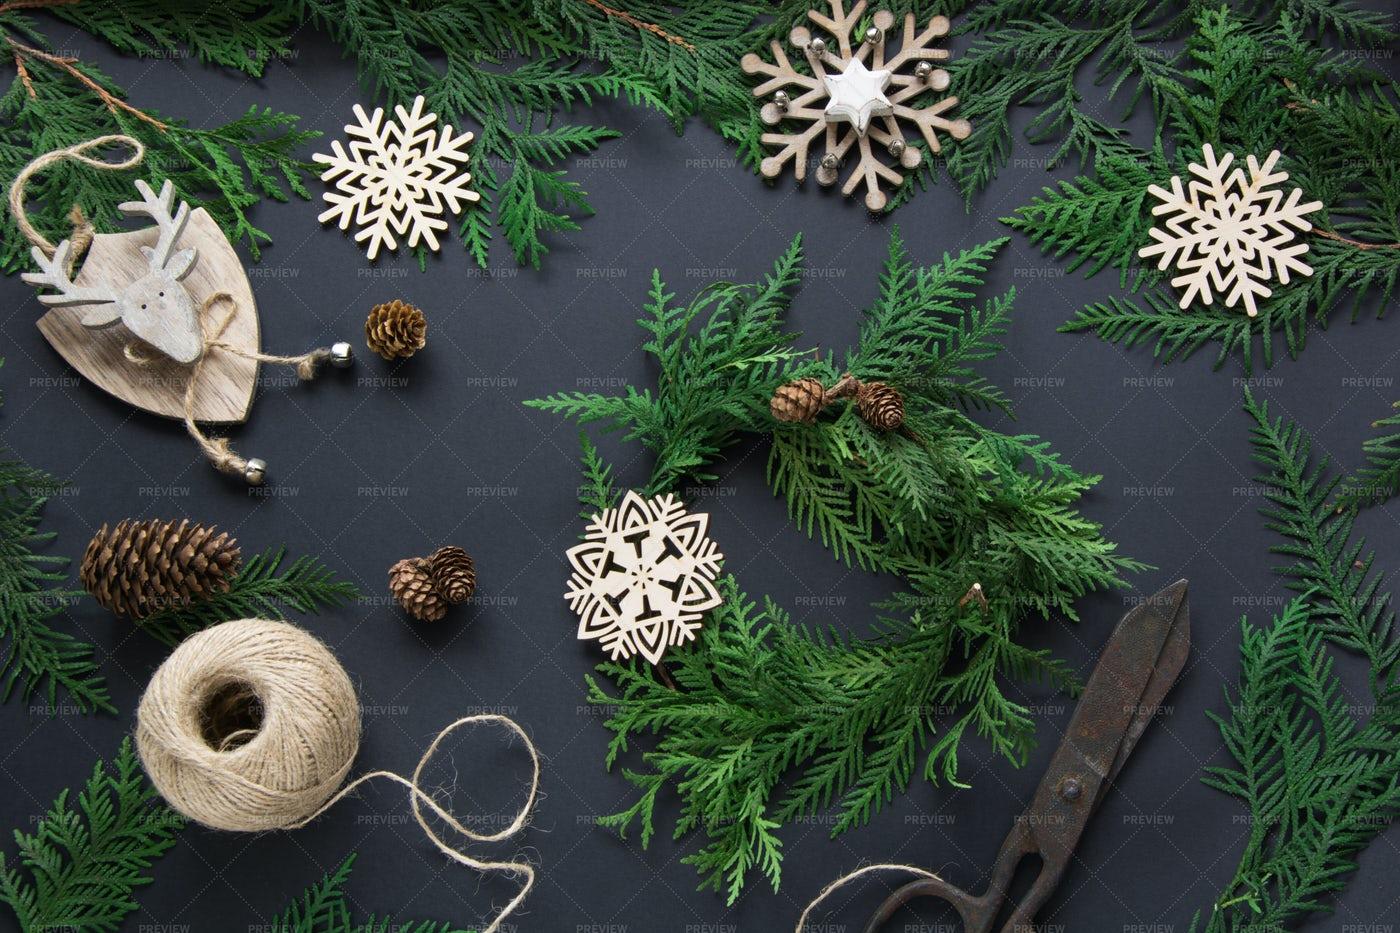 Christmas Holiday Decorations: Stock Photos